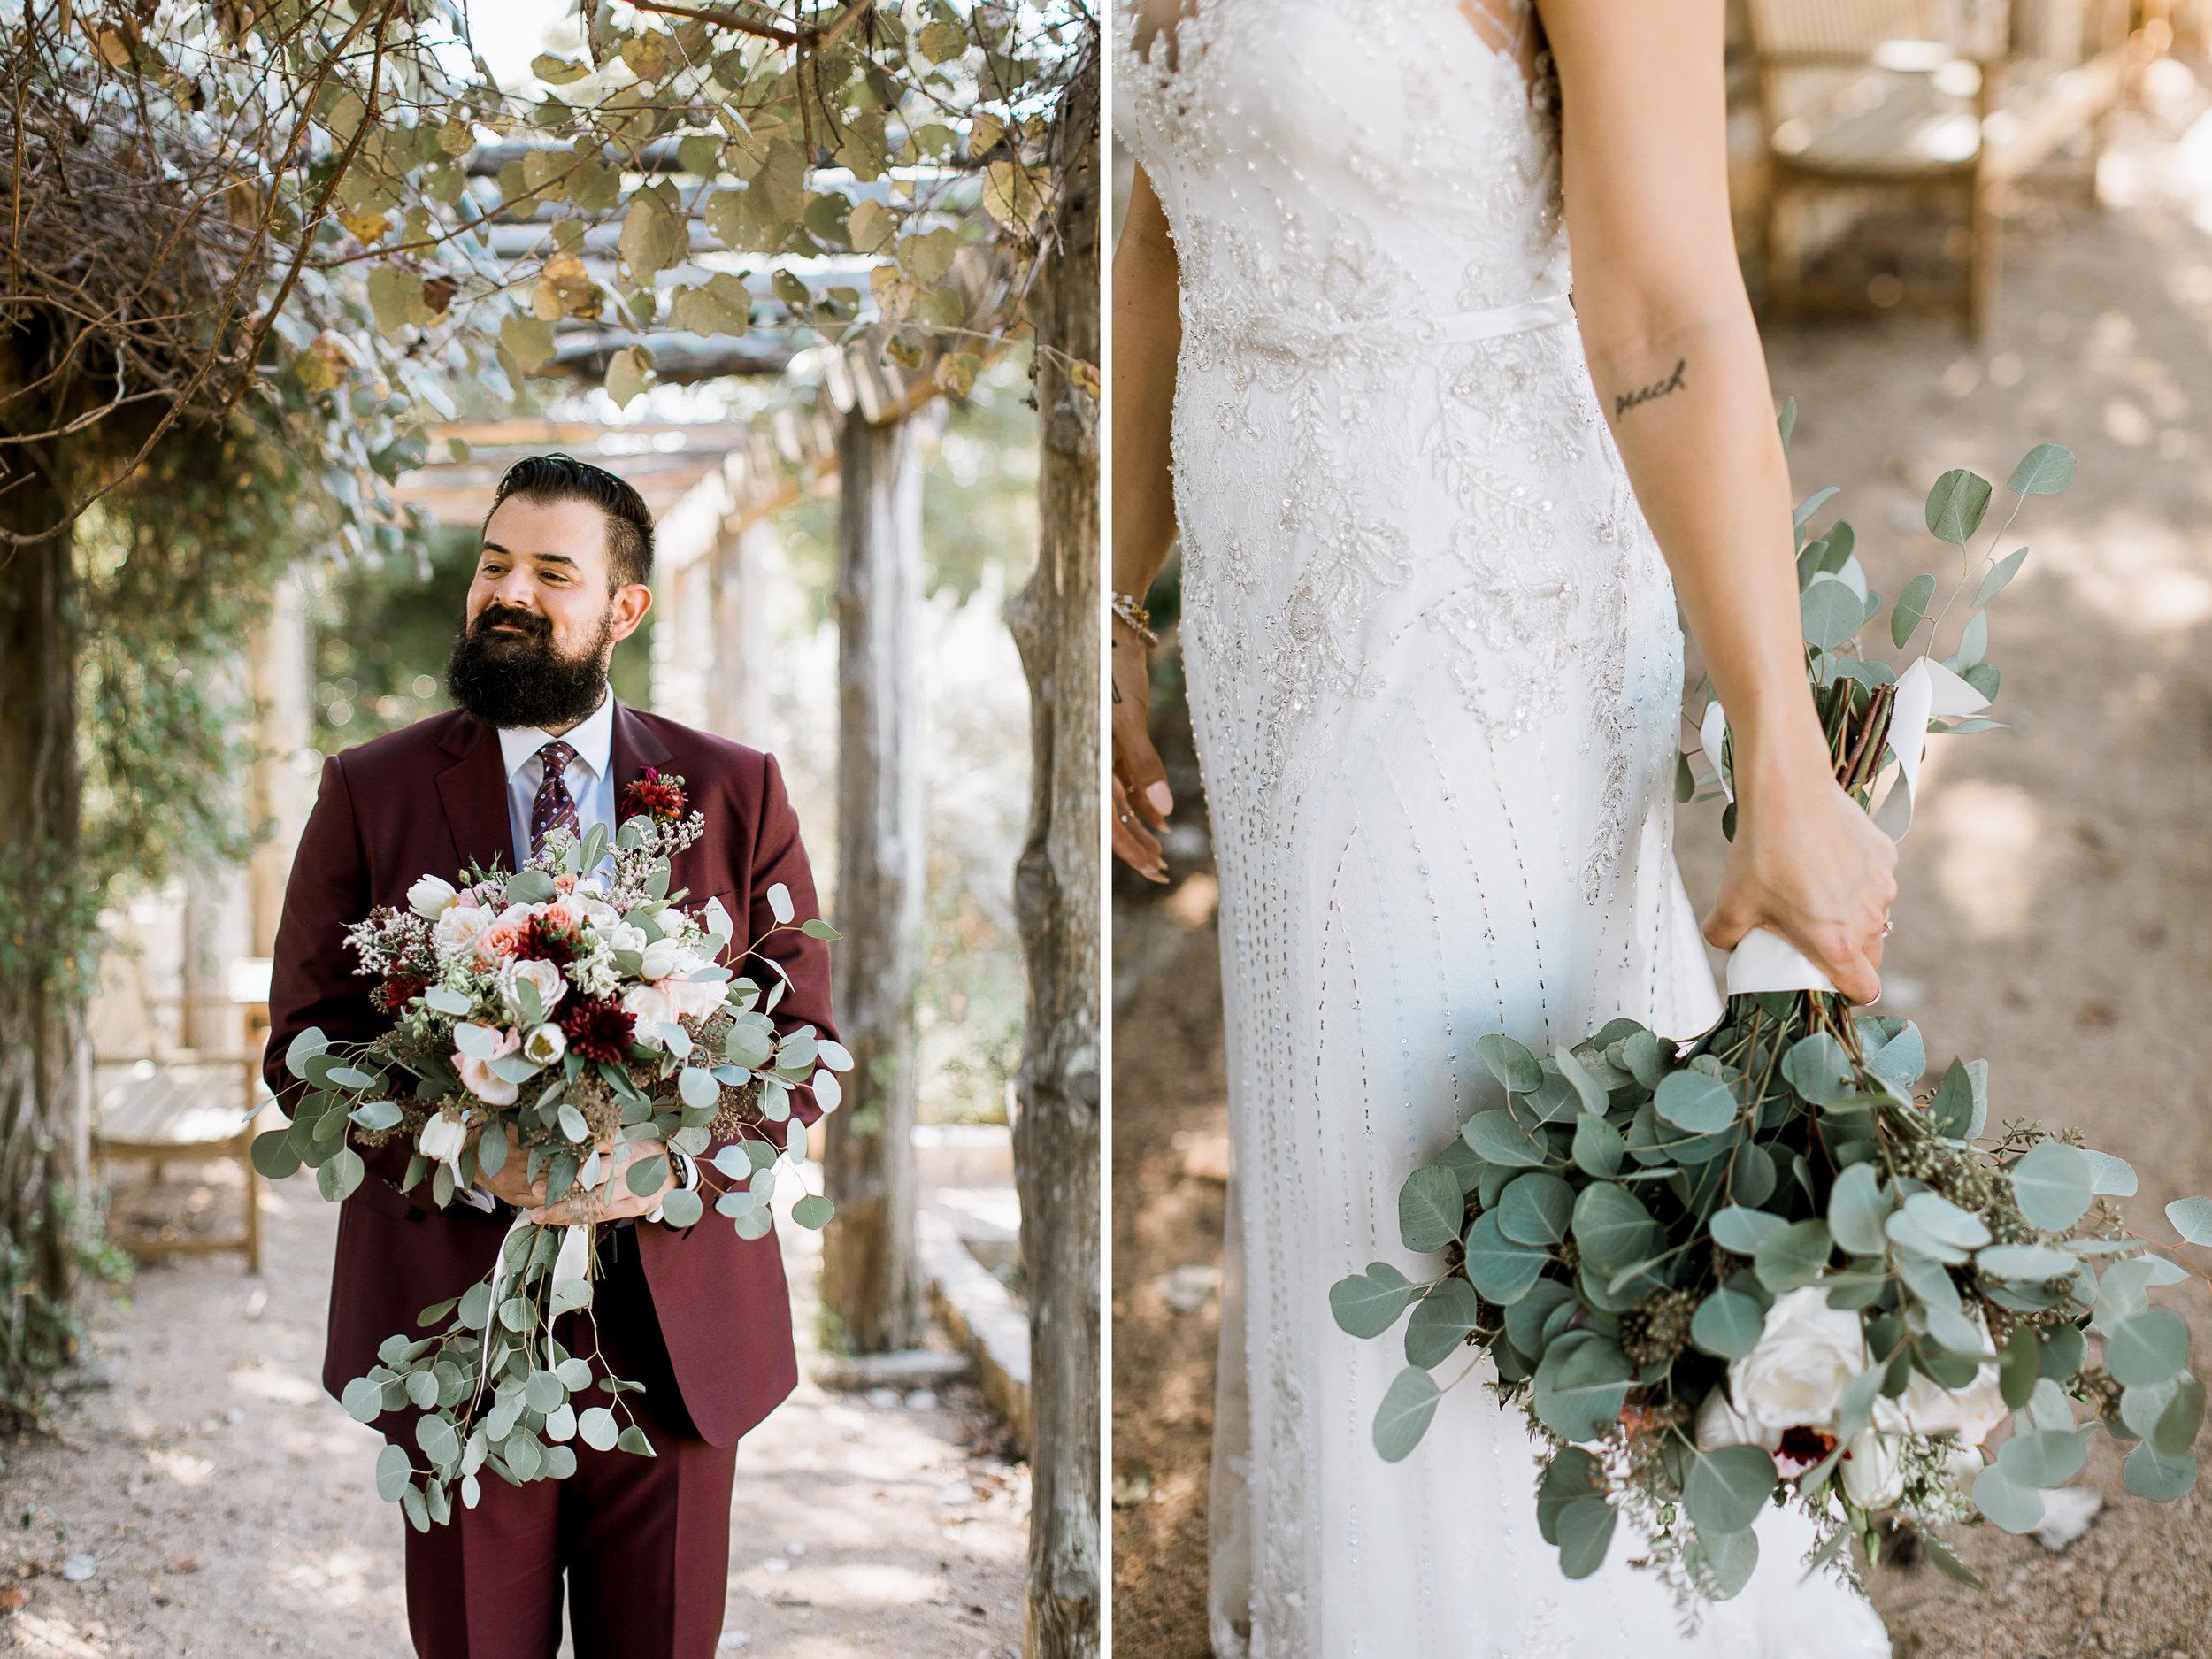 hipster bride & groom // Fall Garden party wedding at Lady Bird Johnson Wildflower Center // austin, texas wedding photographer // www.abbihearne.com